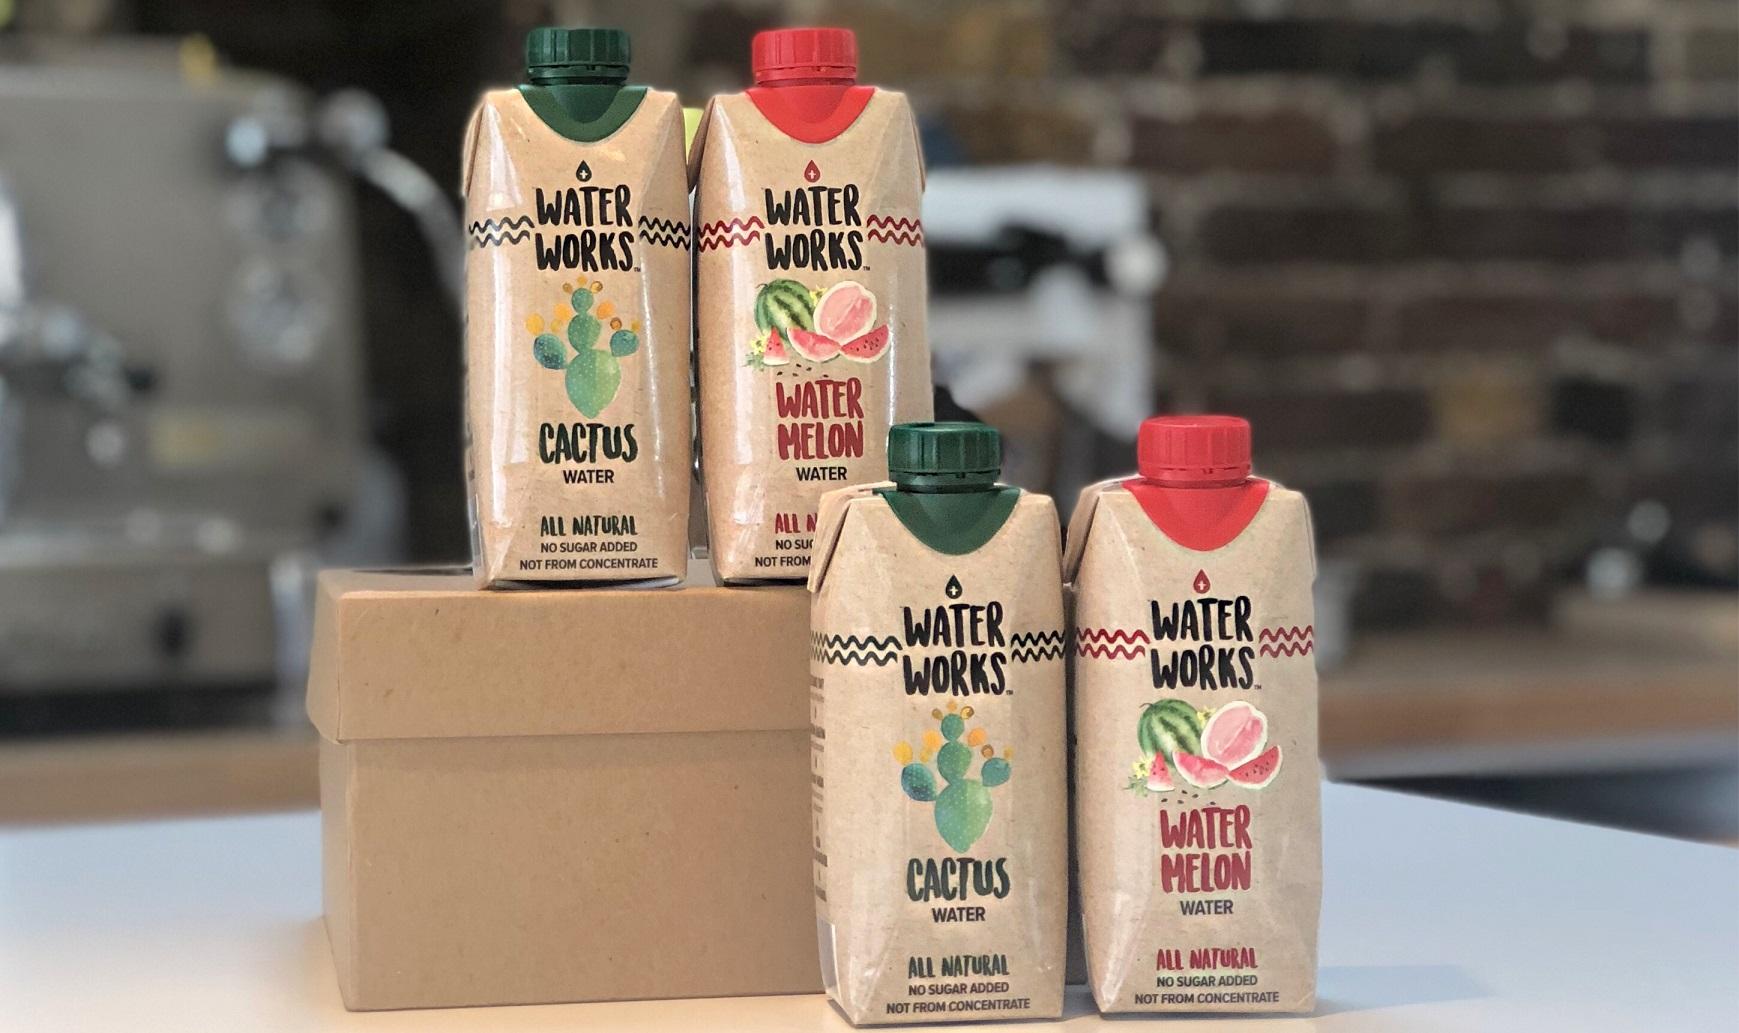 Second Taste of Improved Water Works